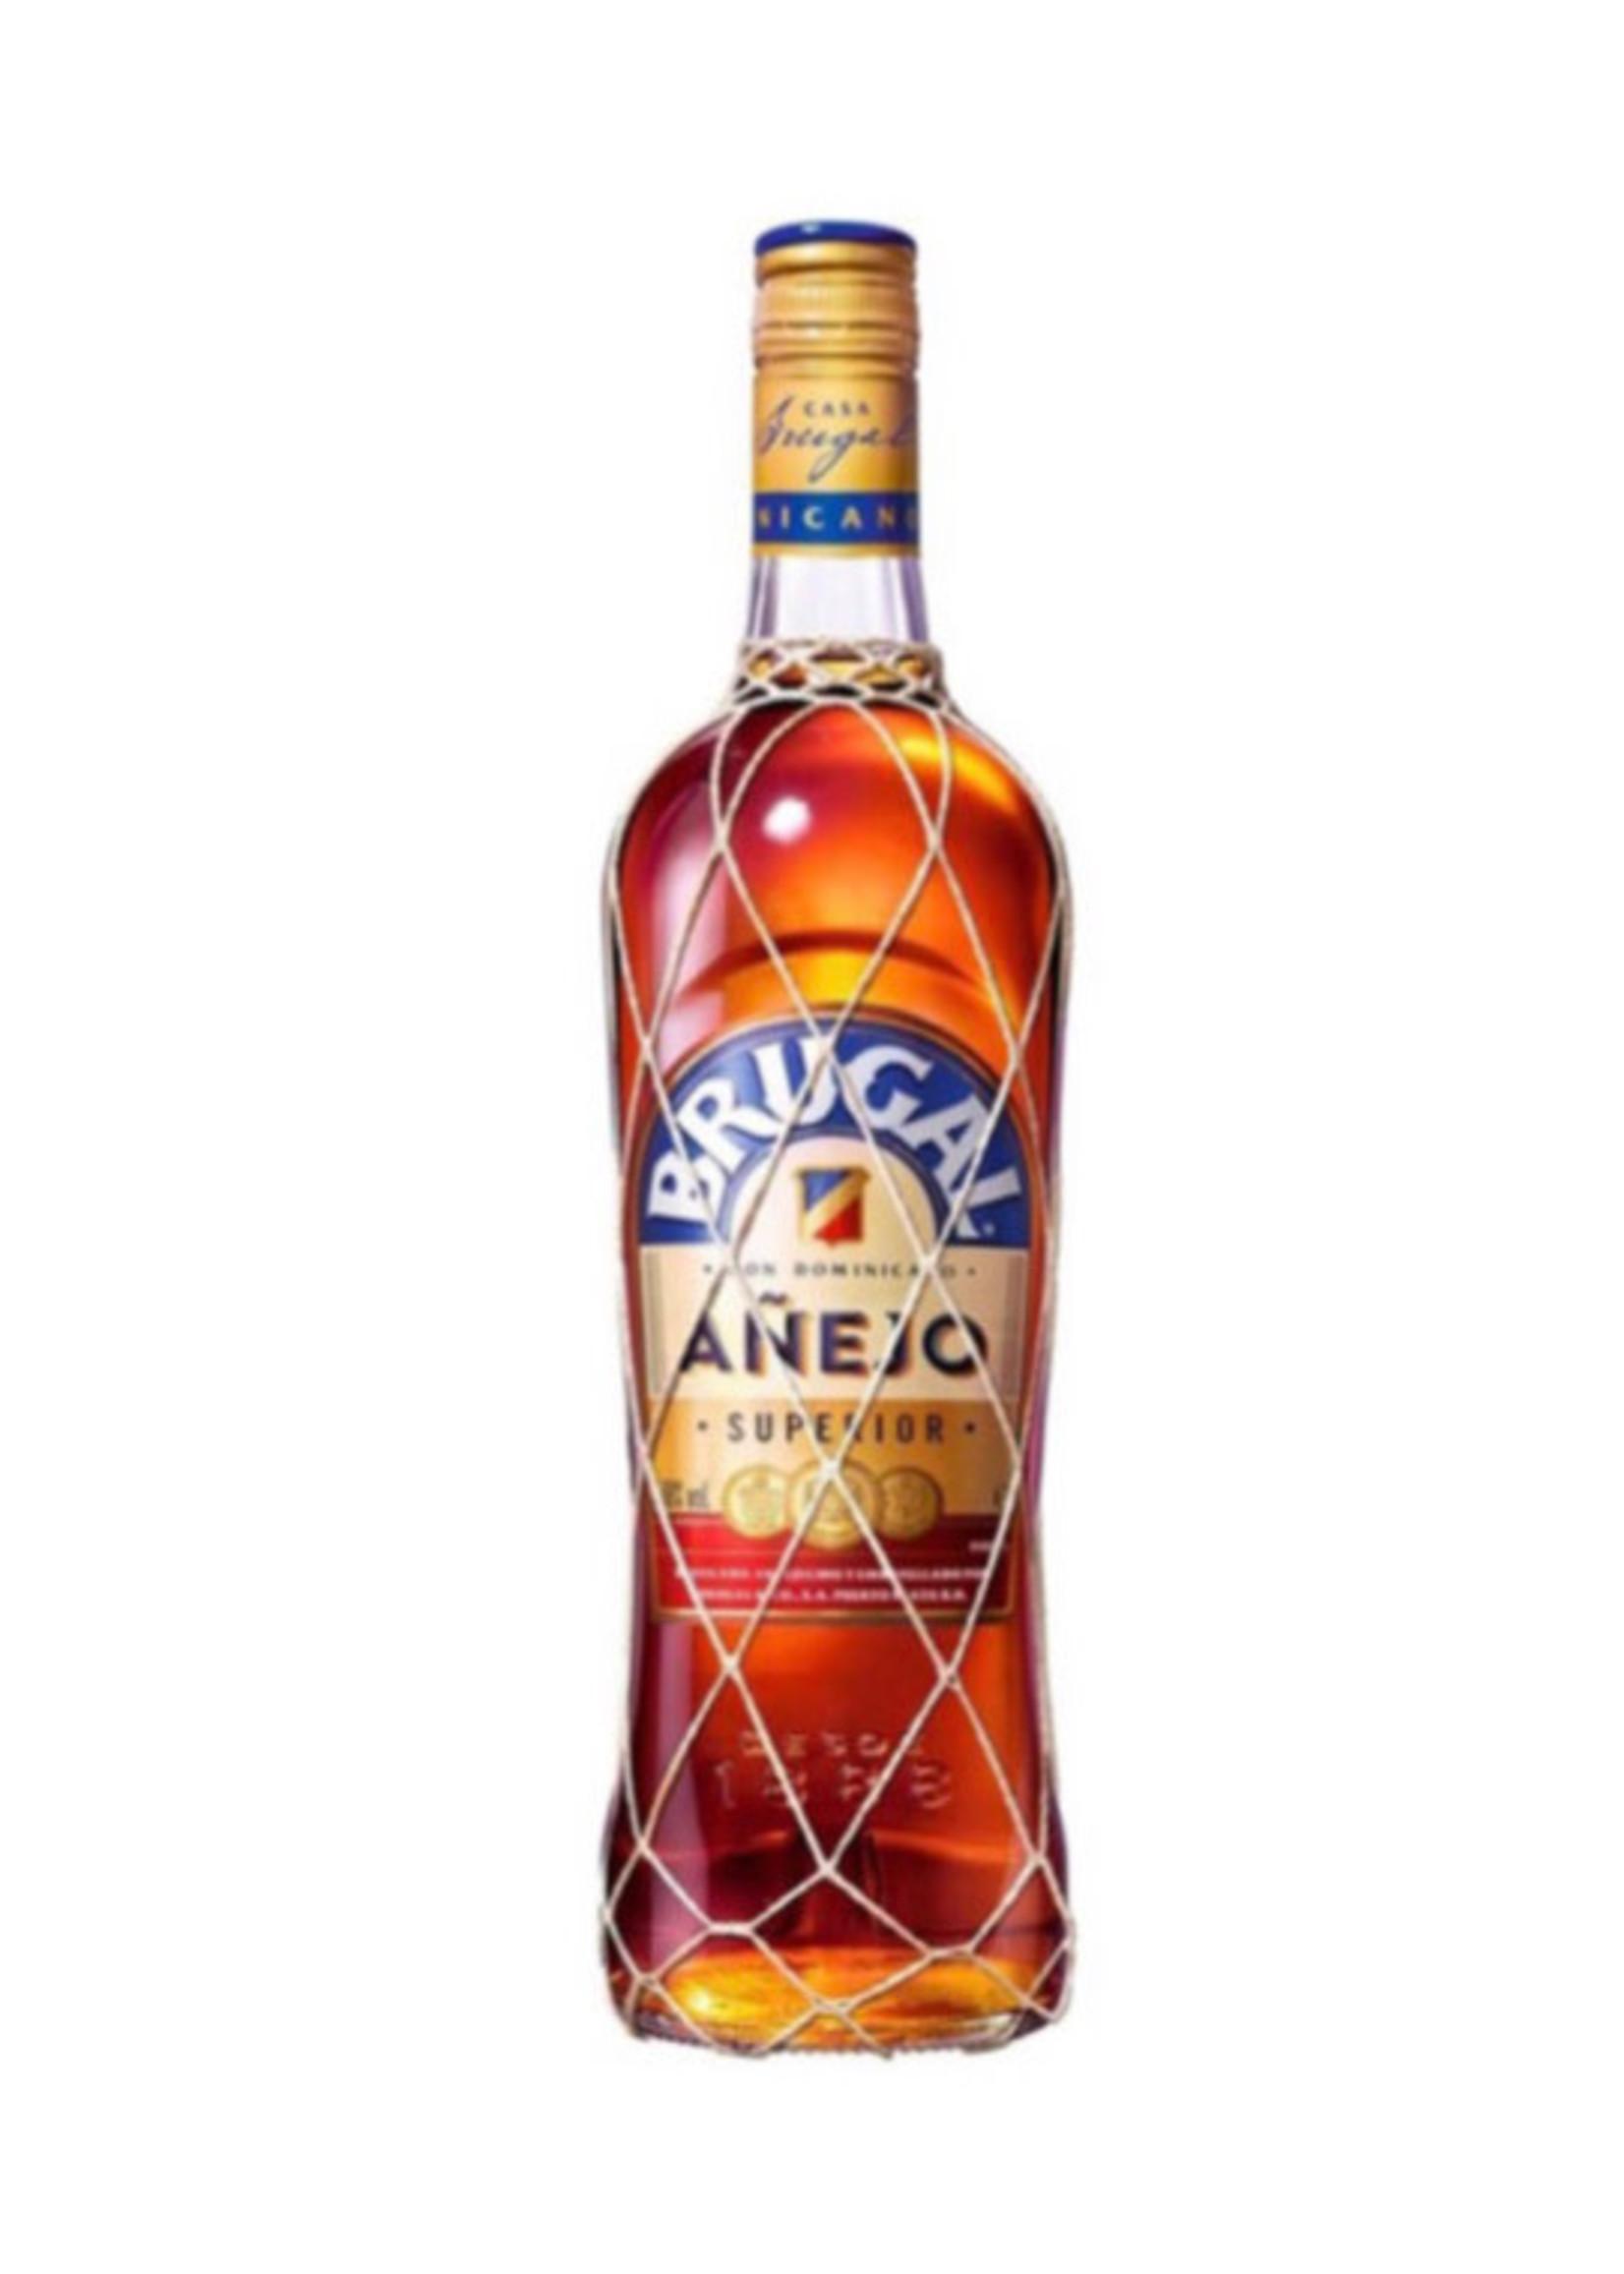 Brugal Anejo Rum 375mL